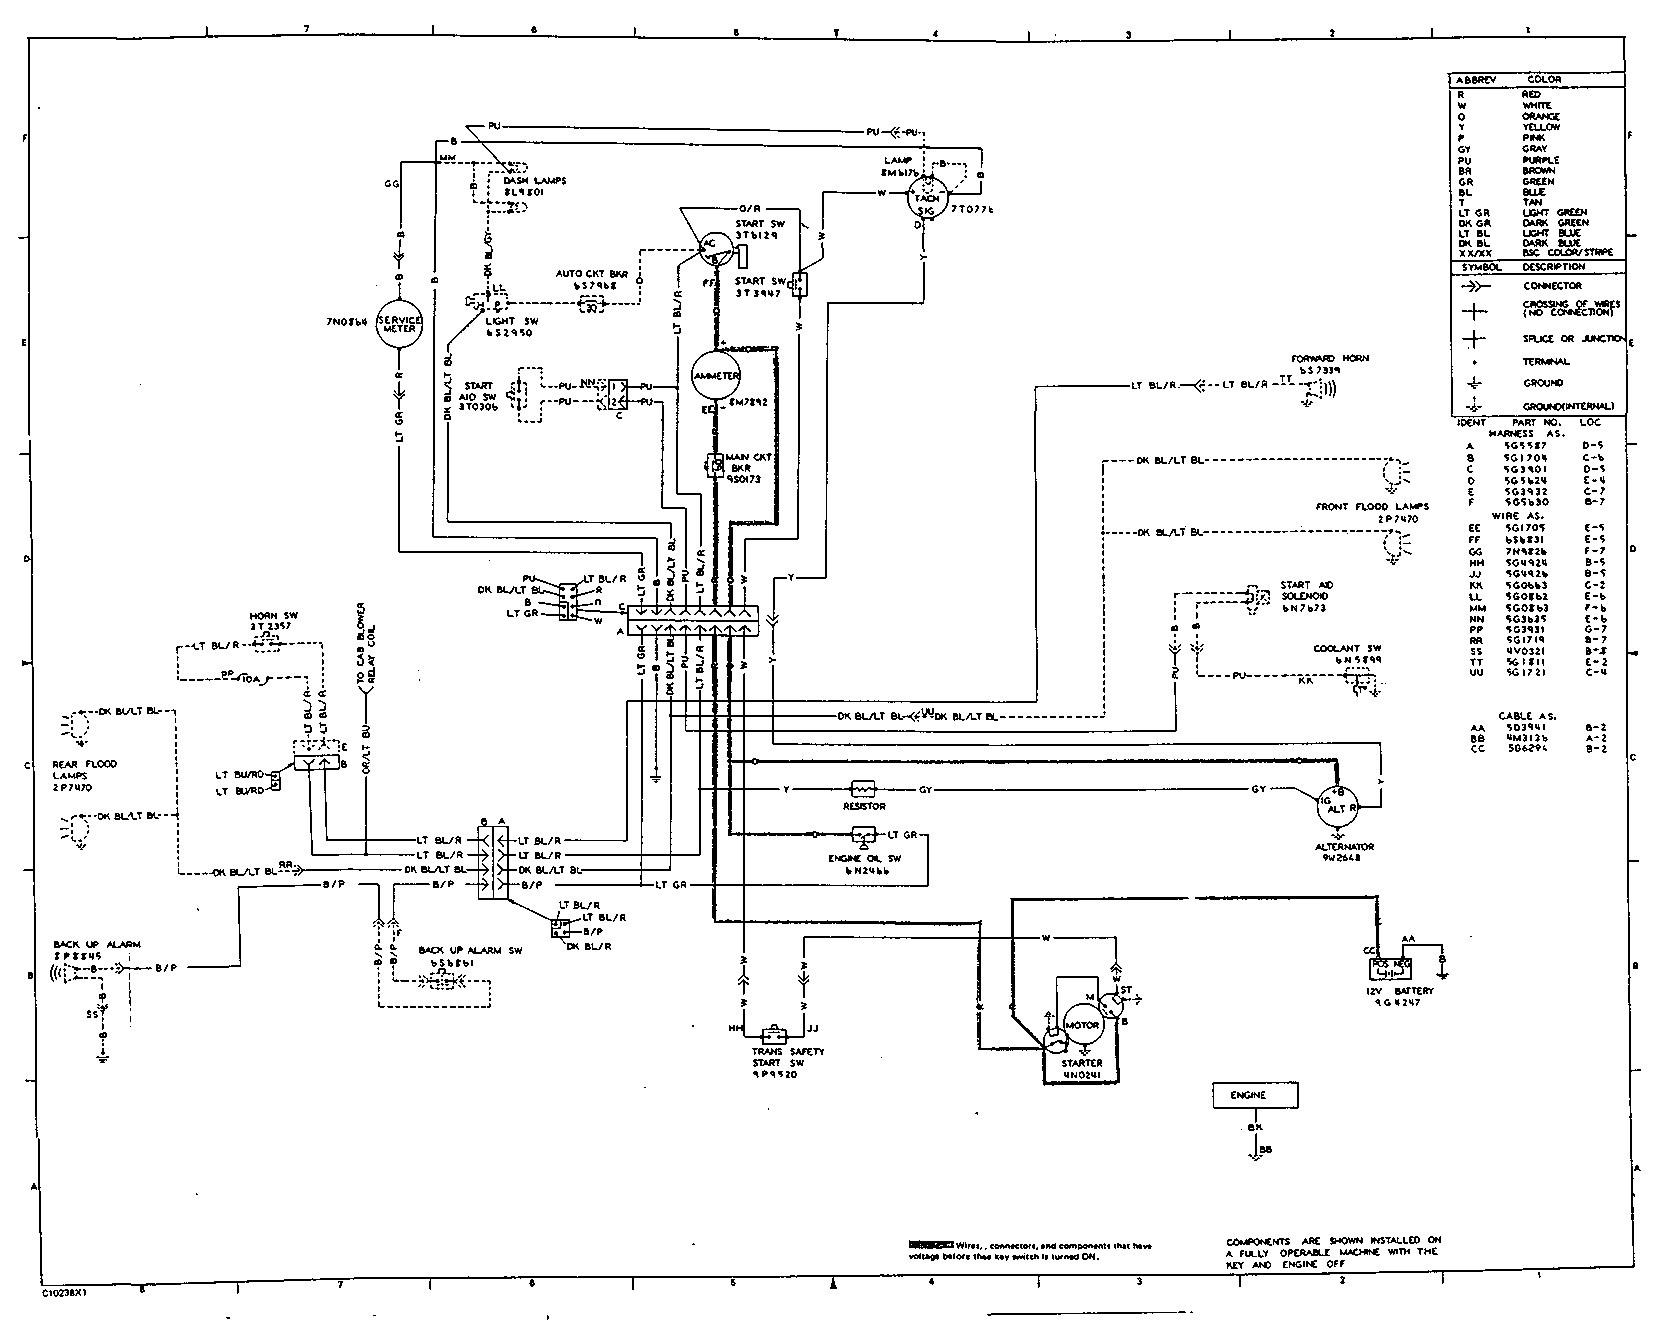 hight resolution of 2004 cat c7 ecm wiring diagram wiring solutions rh rausco com c7 cat ecm wiring diagram